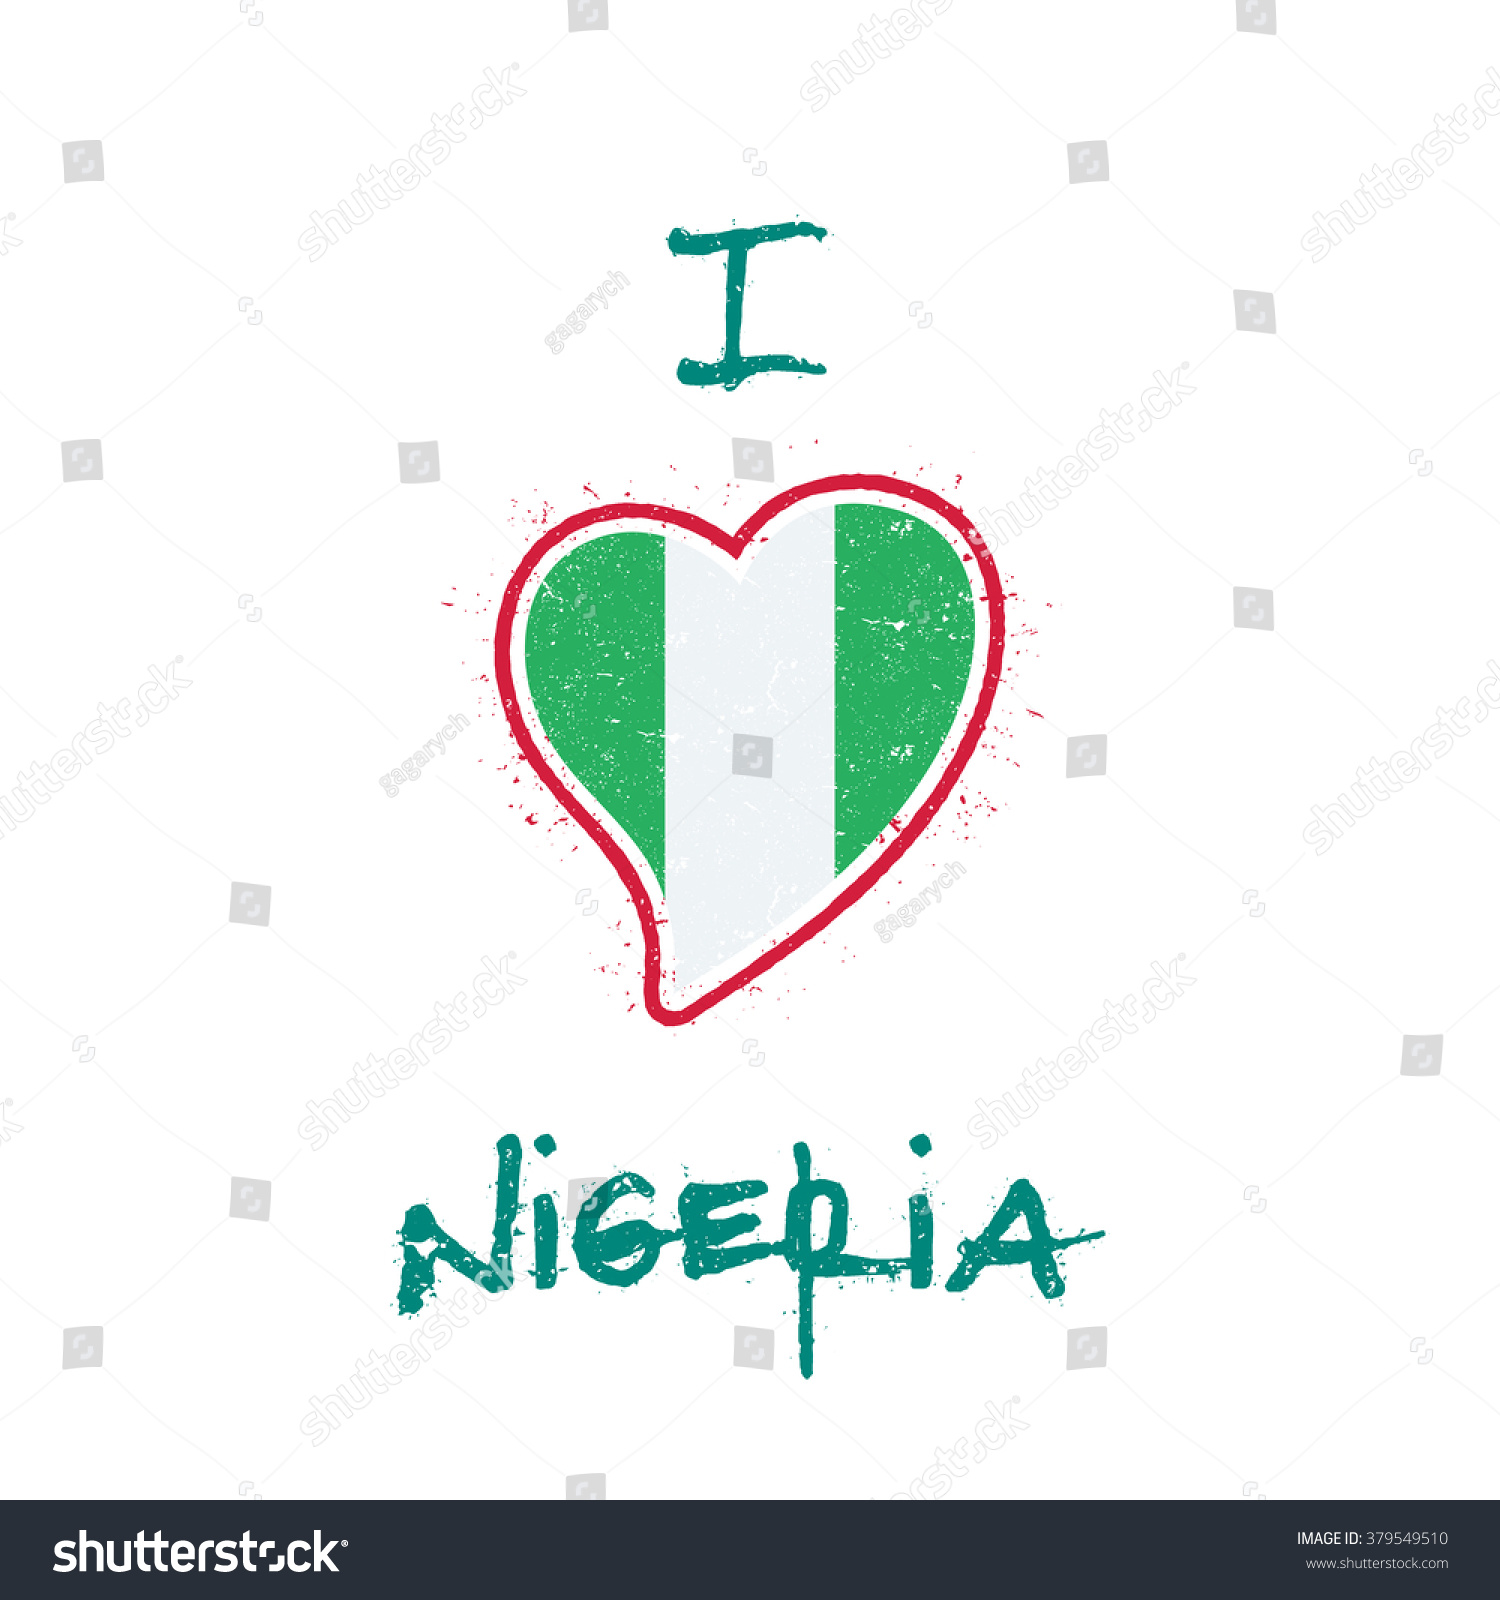 Shirt design in nigeria - Nigeria Flag Patriotic T Shirt Design Heart Shaped National Flag Of Nigeria On White